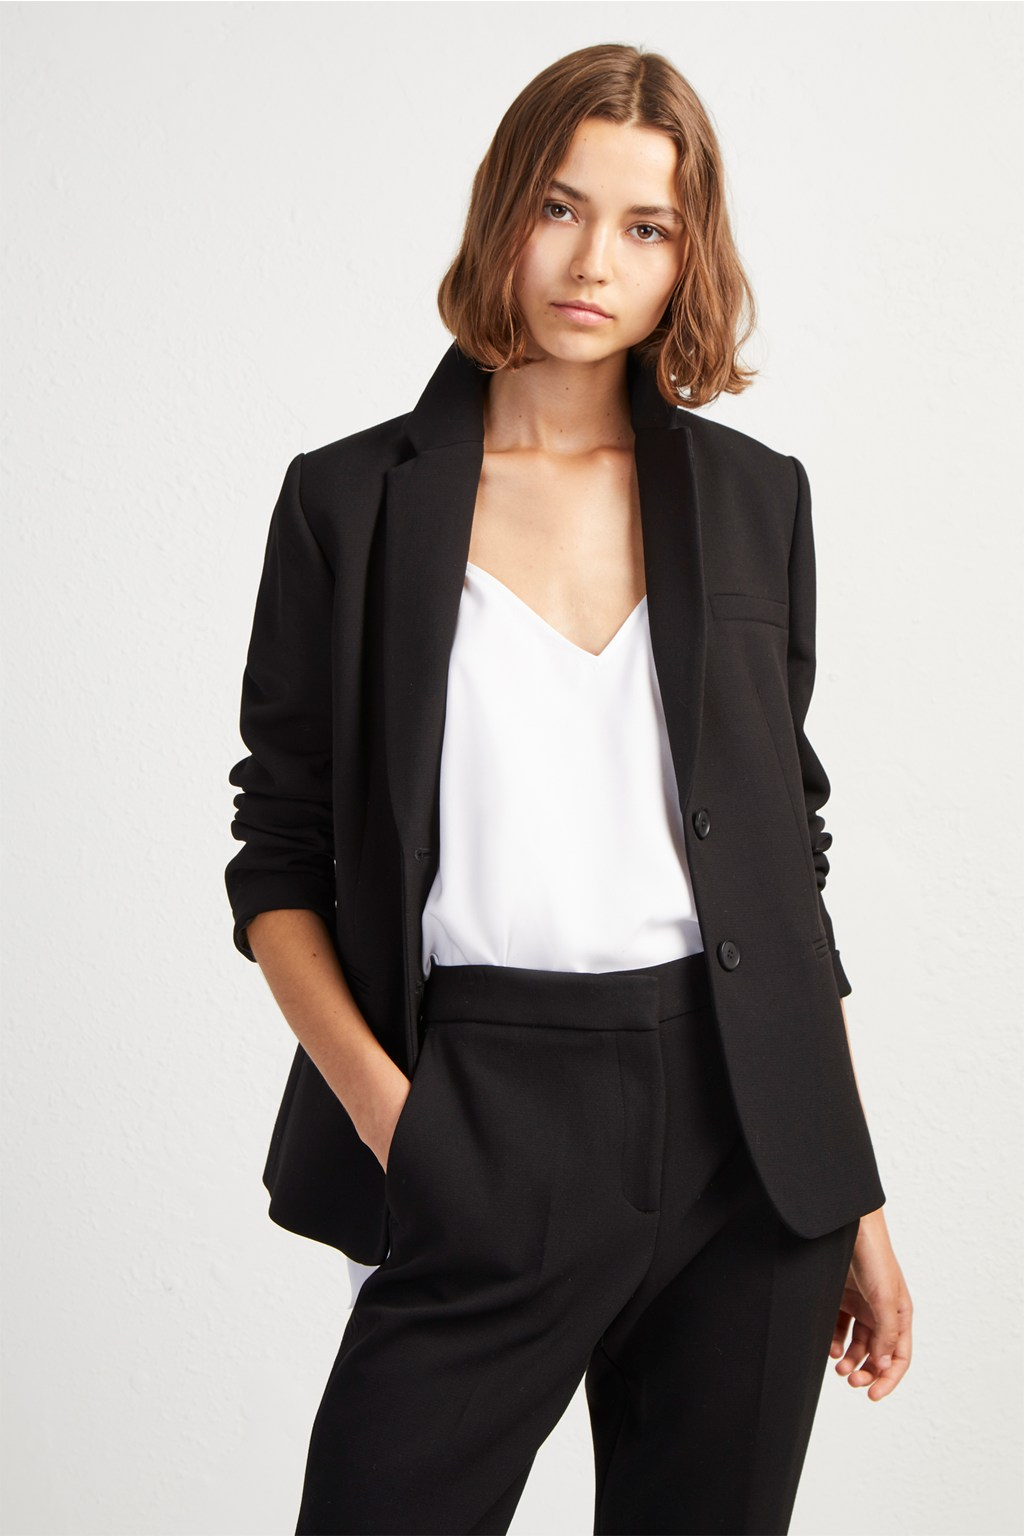 French blazer